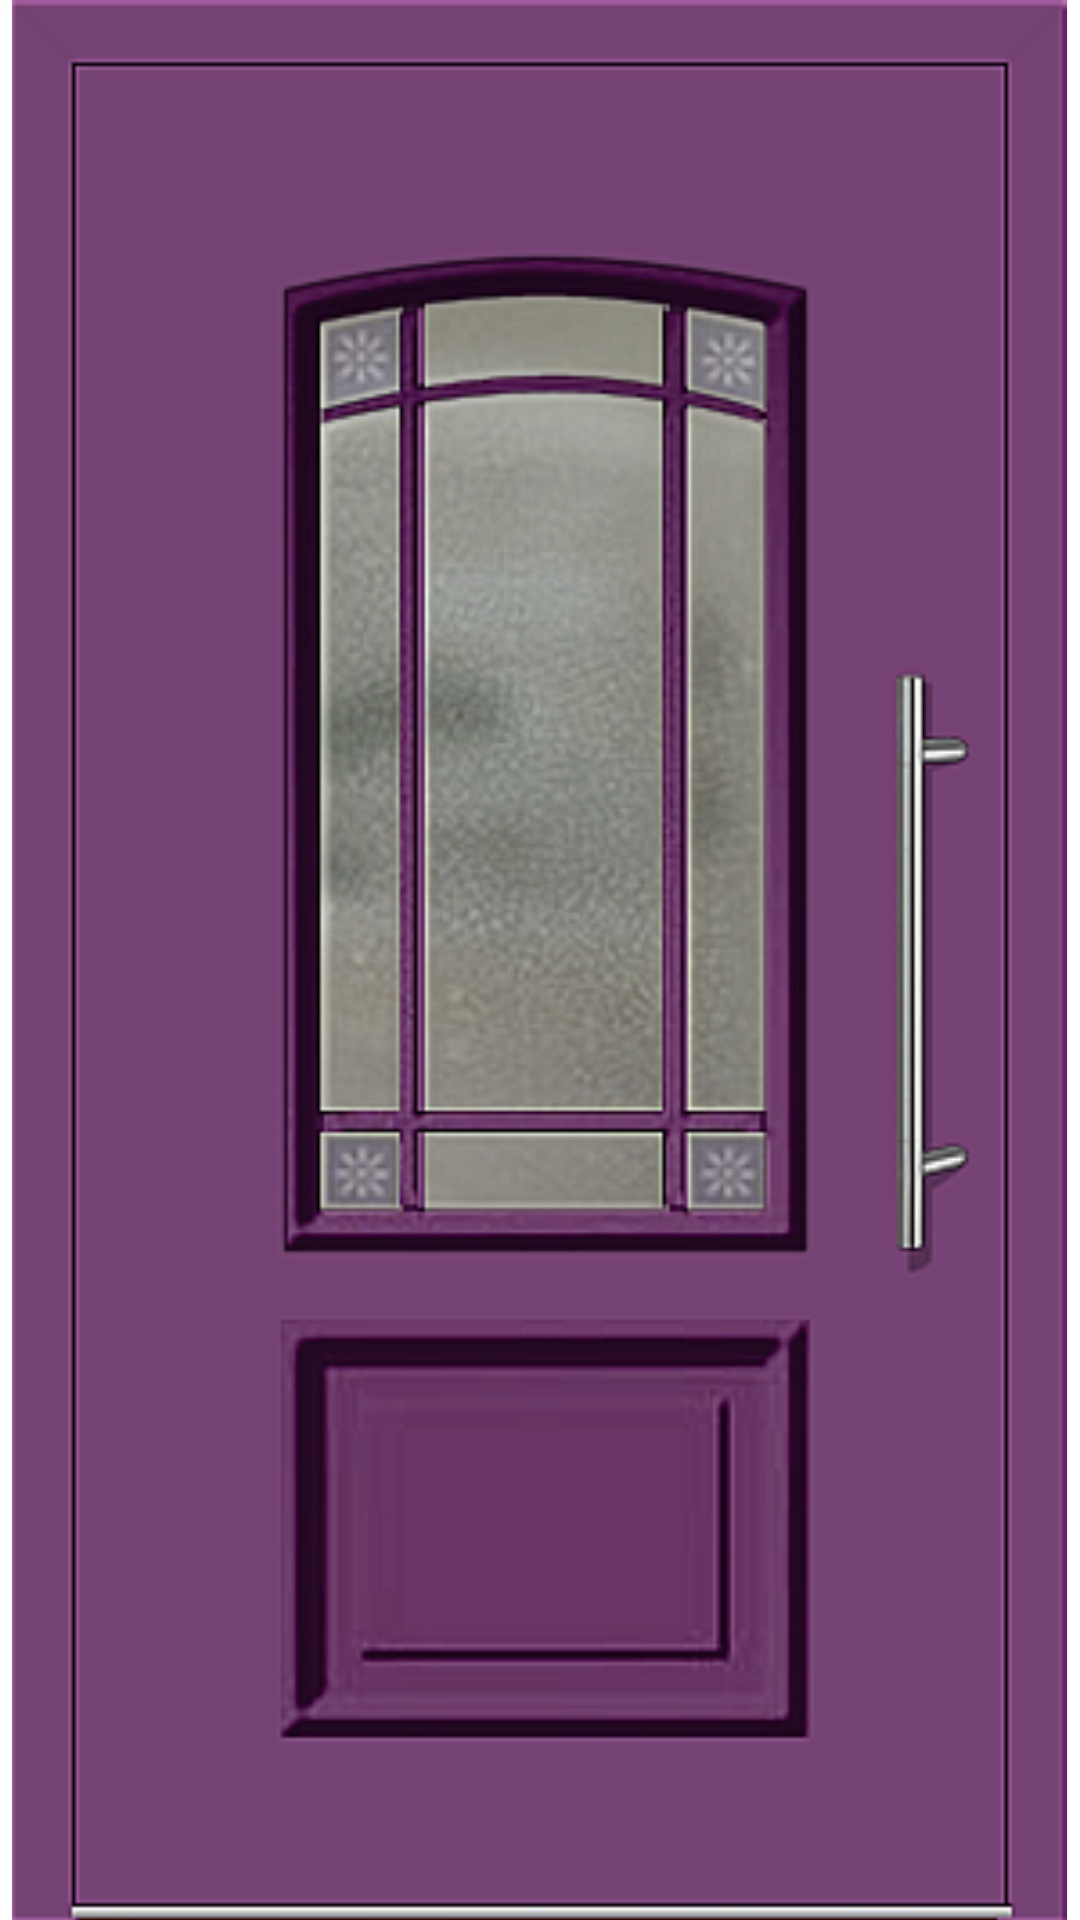 Kunststoff Haustür Modell 6456-15 singalviolett